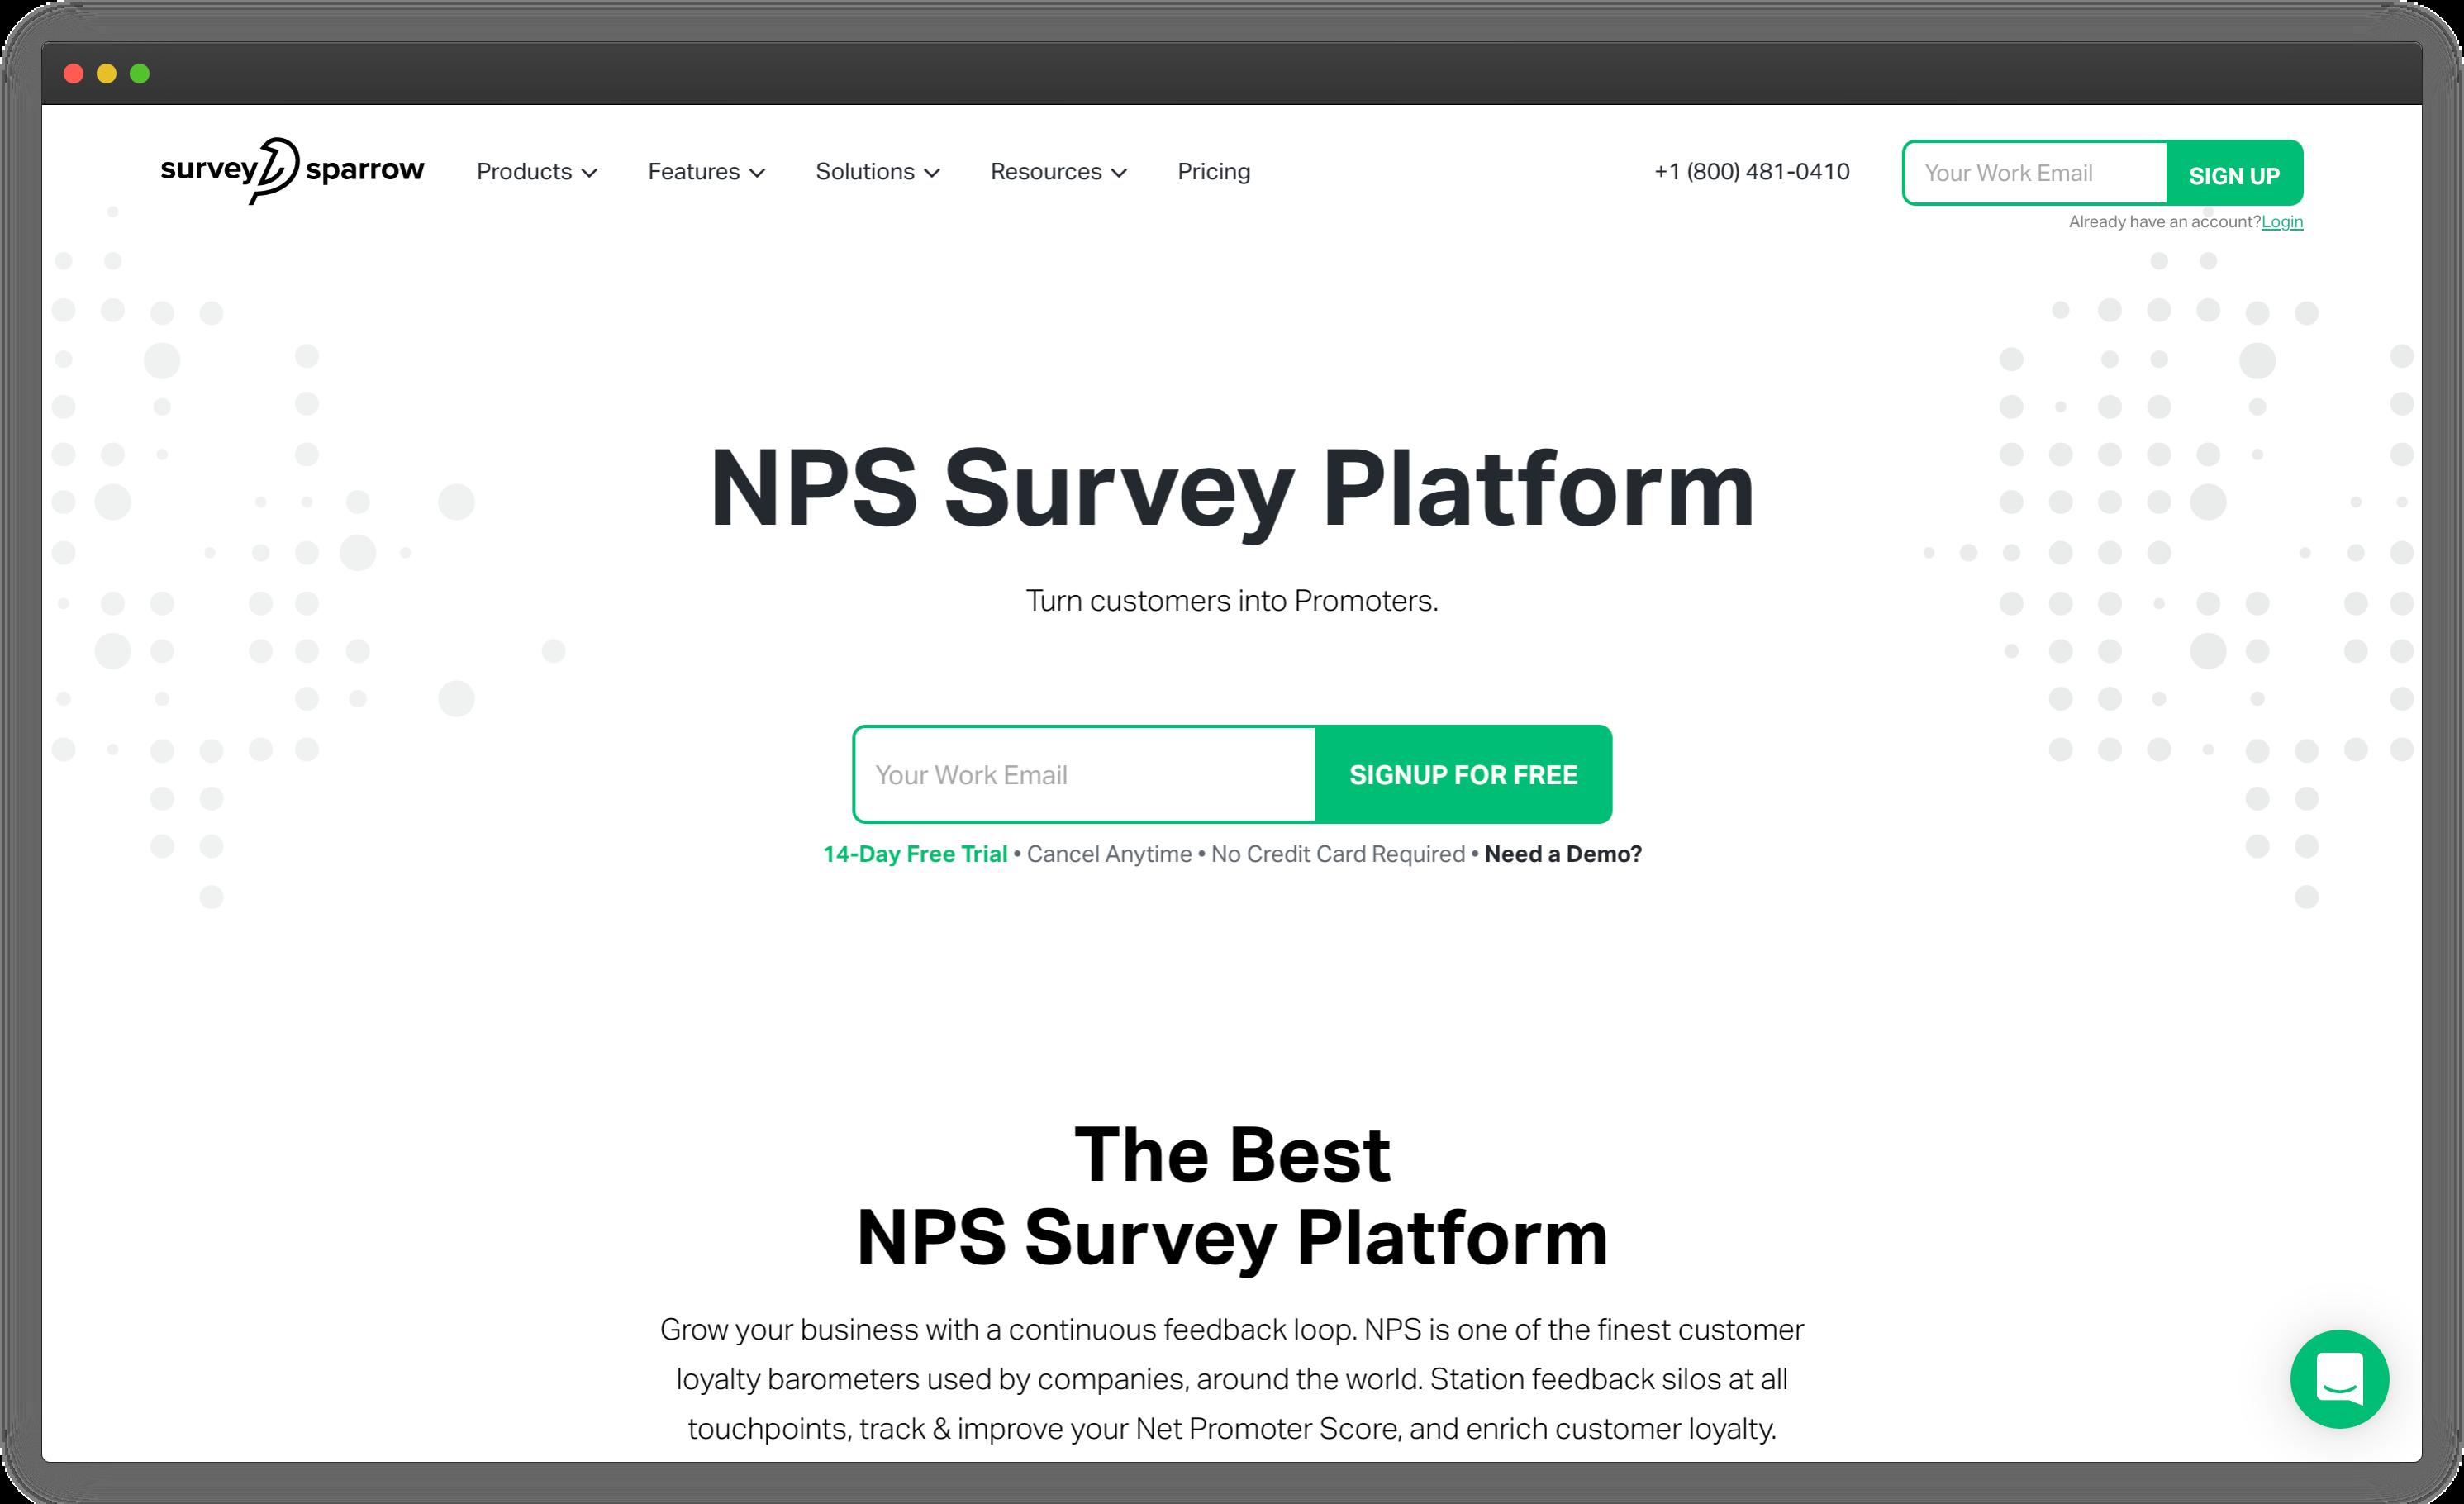 Survey Sparrow - NPS Software